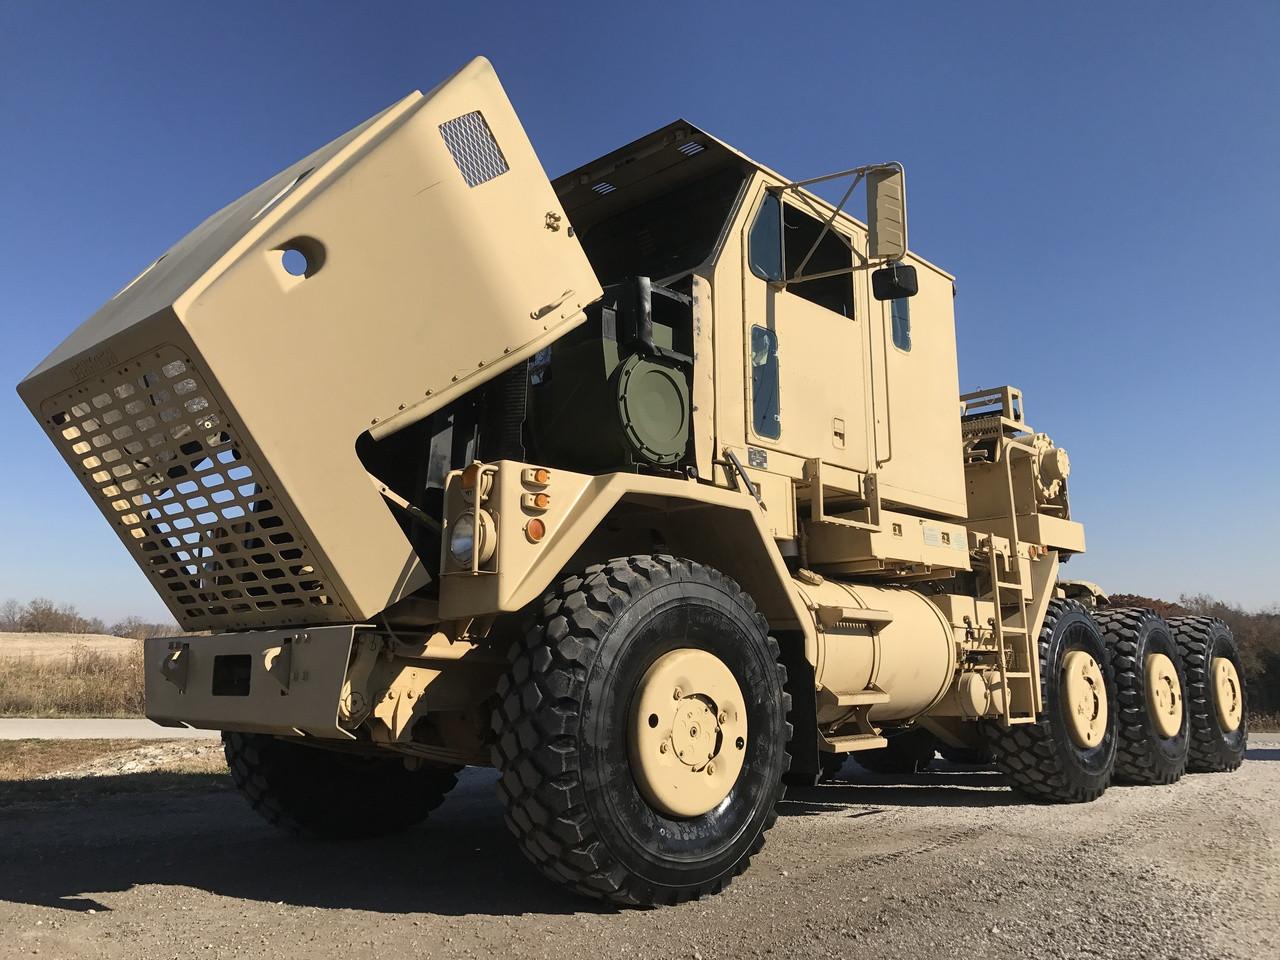 Oshkosh M1070 8x8 HET Military Heavy Haul Tractor Truck SOLD